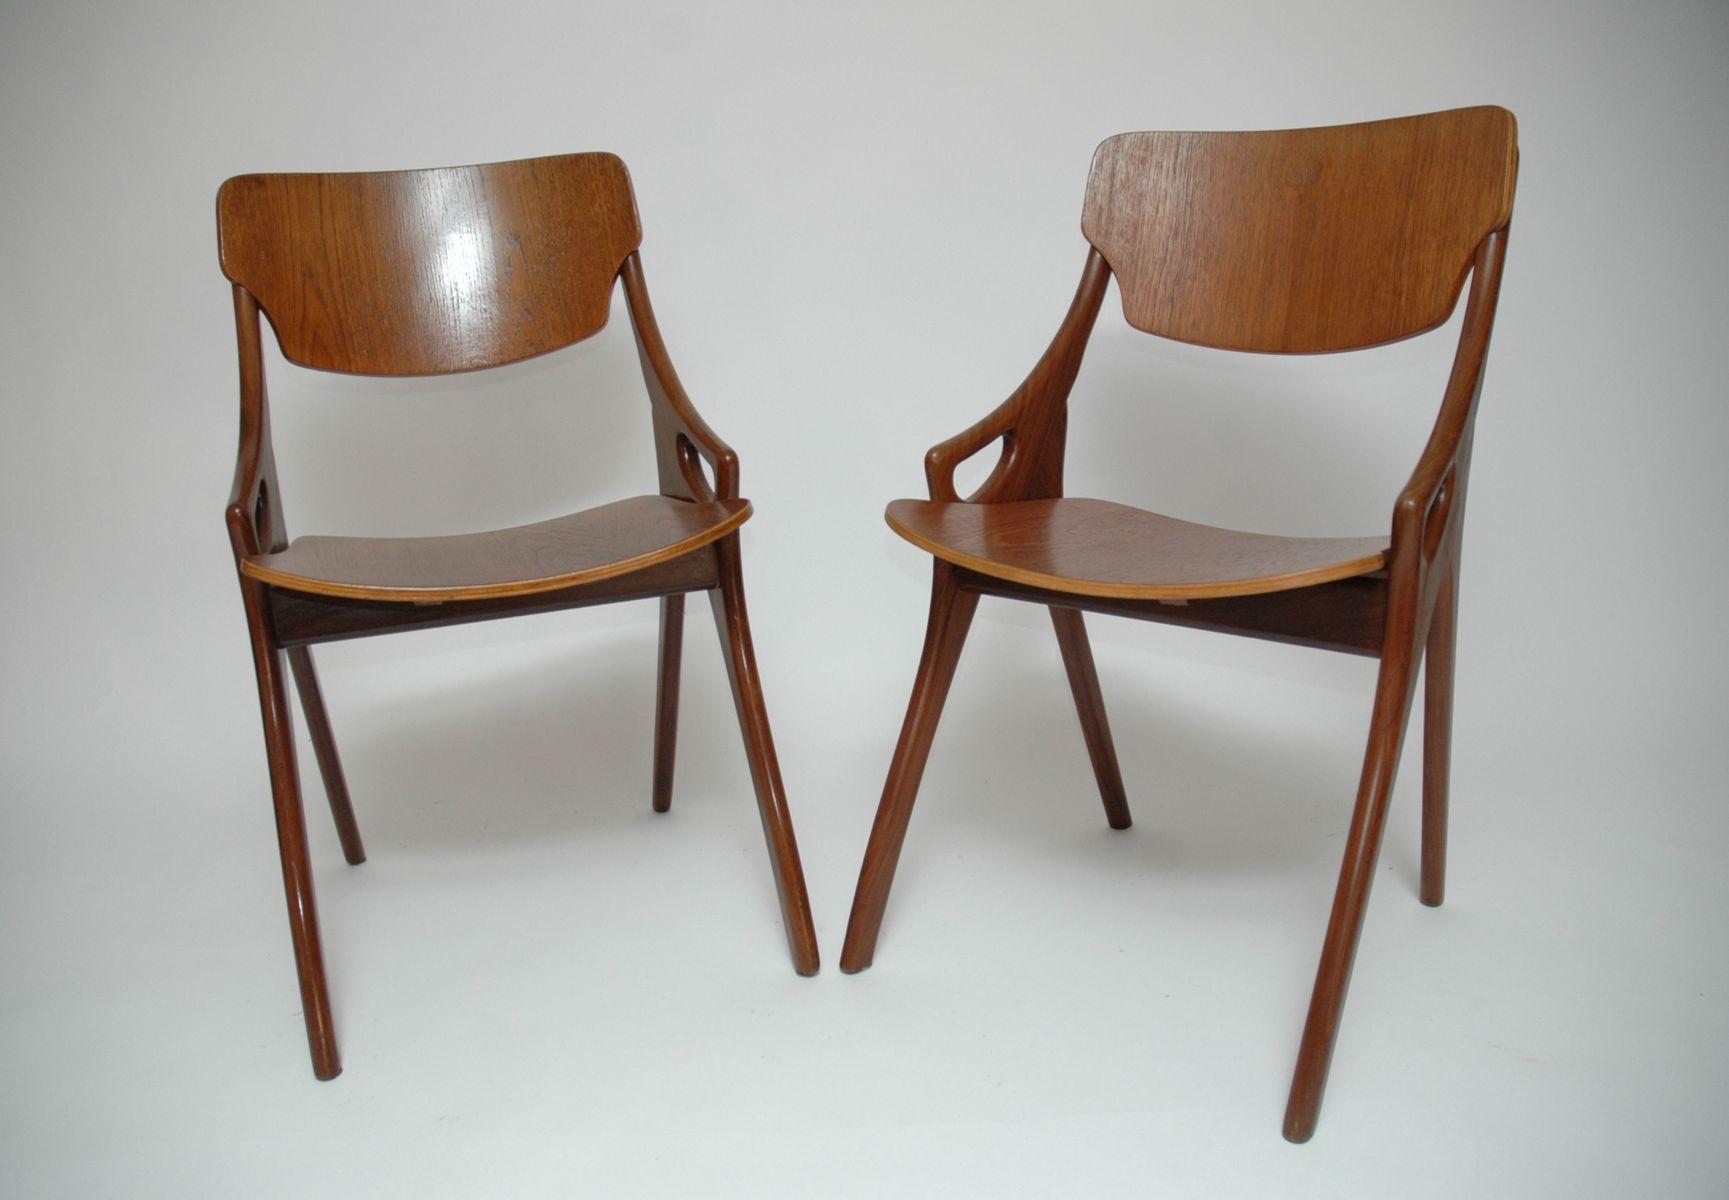 Mid Century Dining Chairs by Arne Hovmand Olsen for Mogens Kold